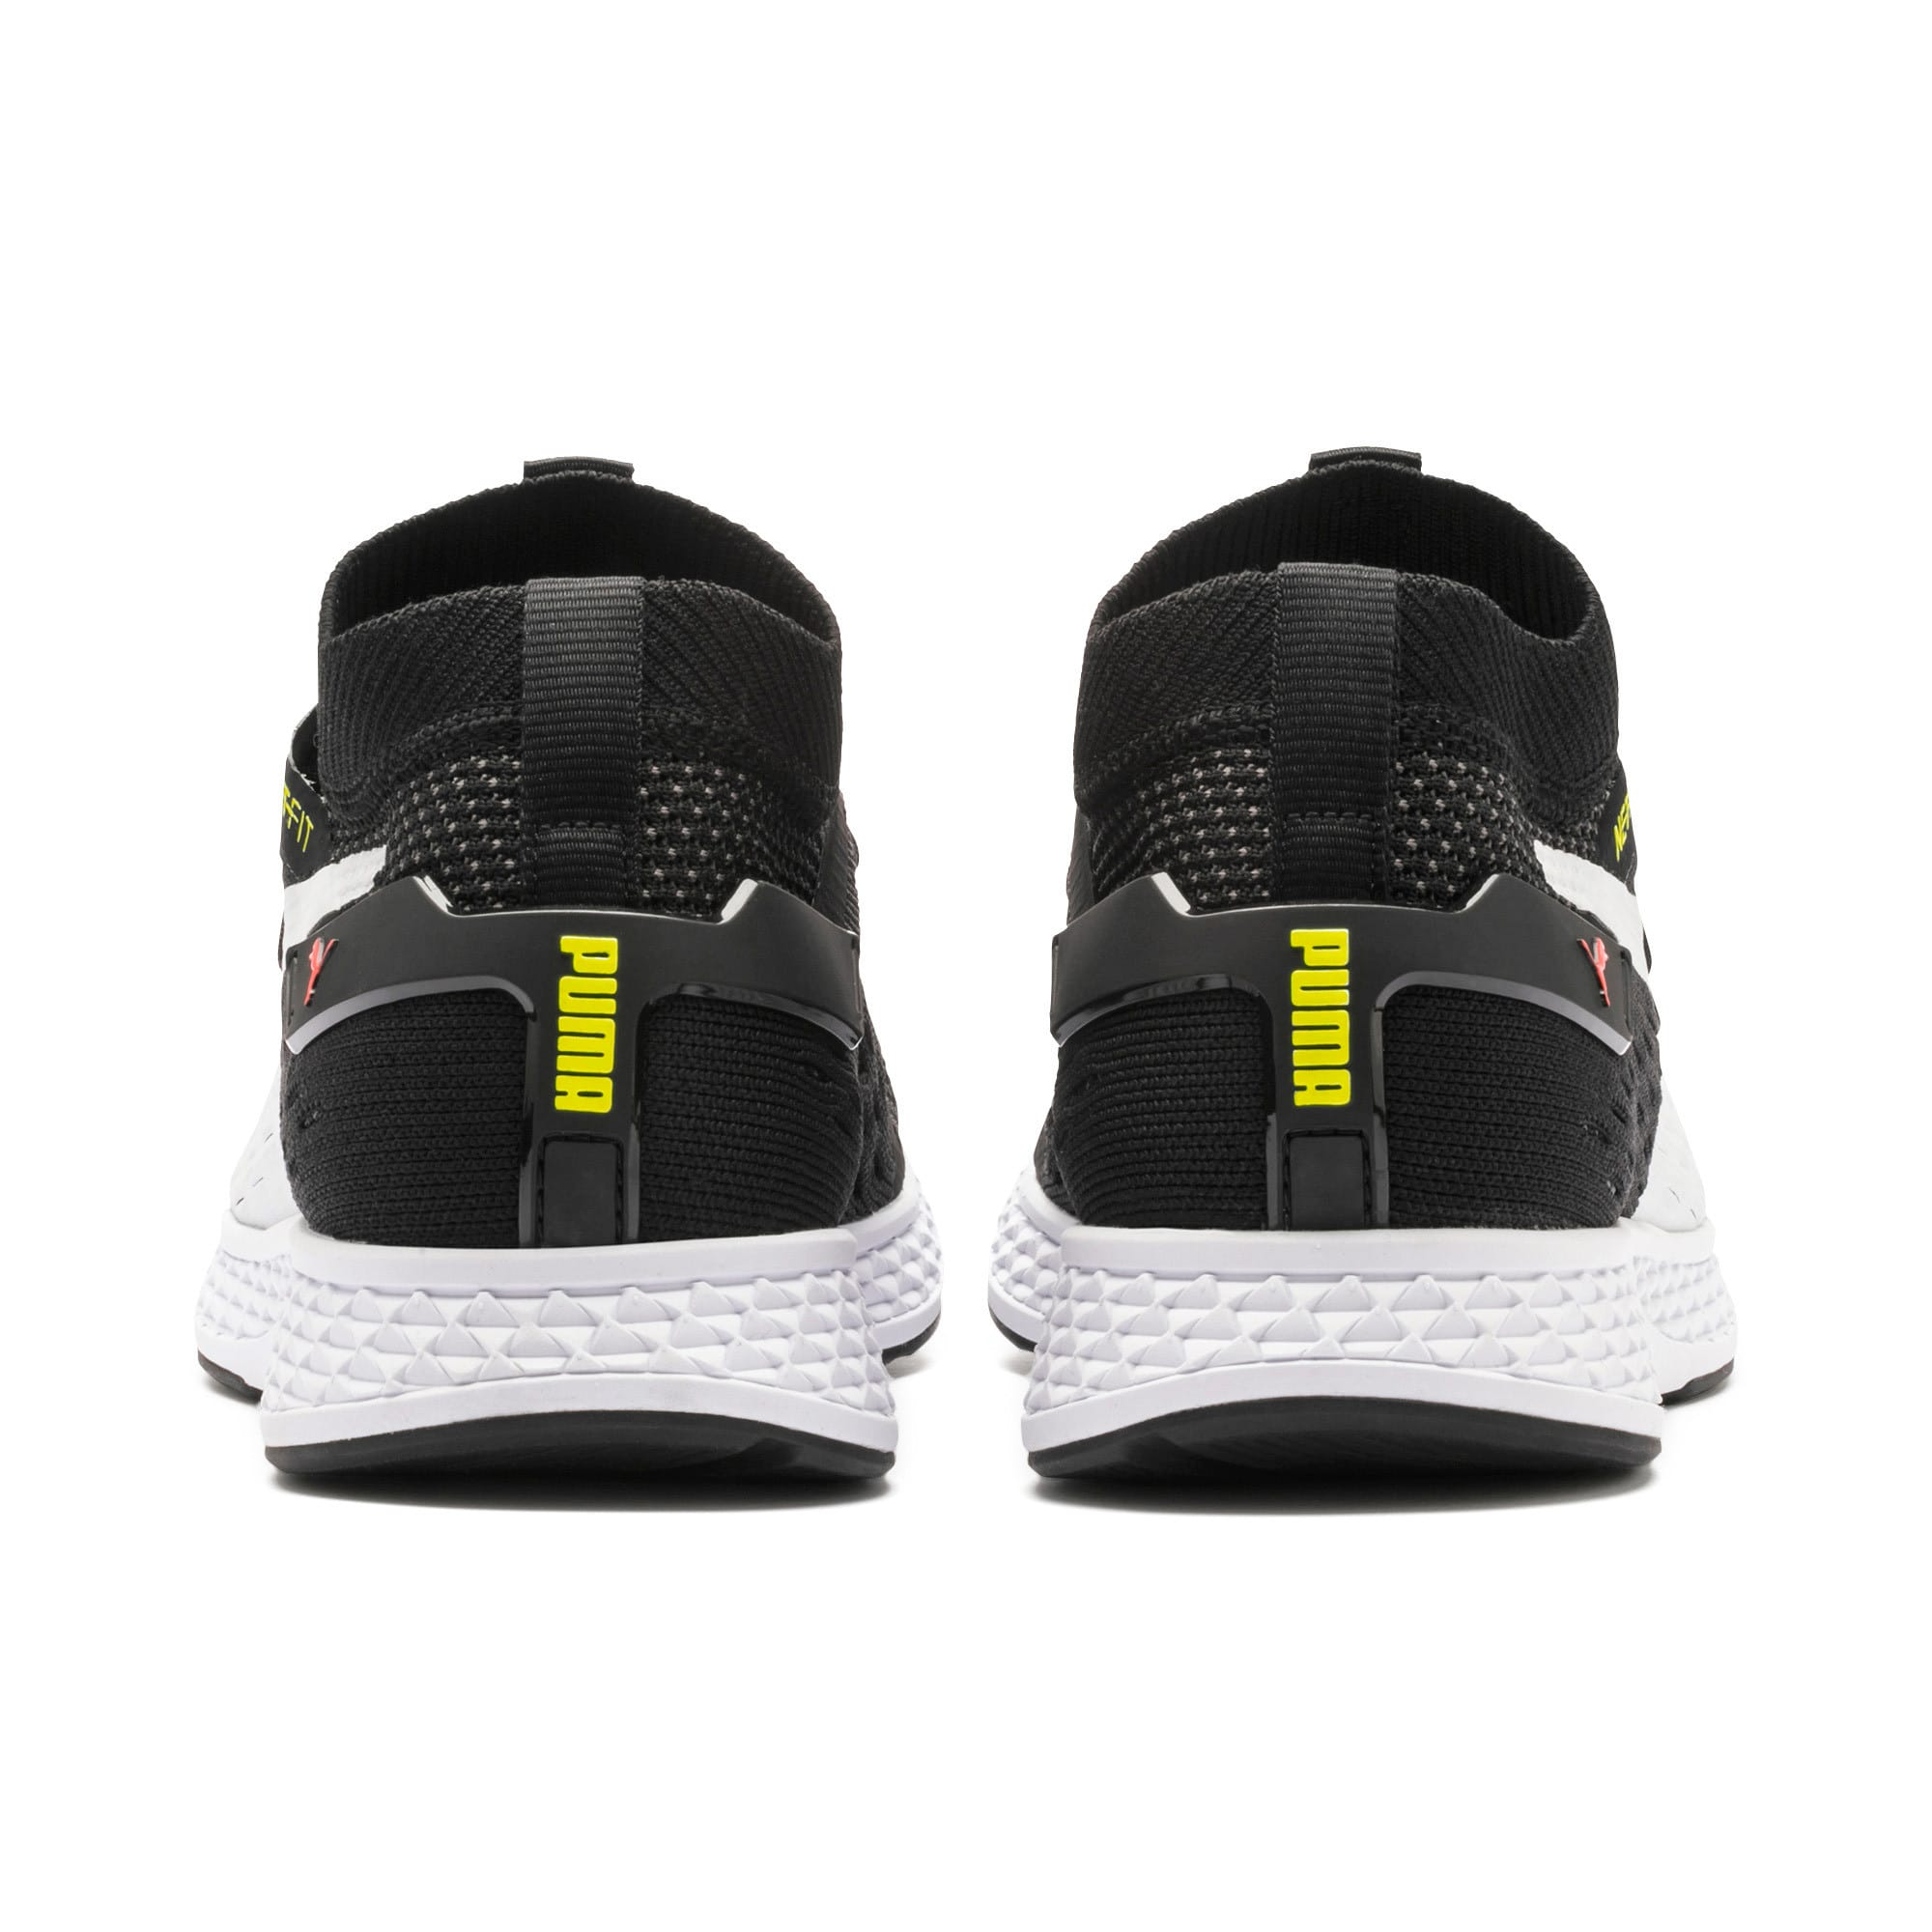 Thumbnail 5 of SPEED 500 Men's Running Shoes, Black-White-Red-Yellow, medium